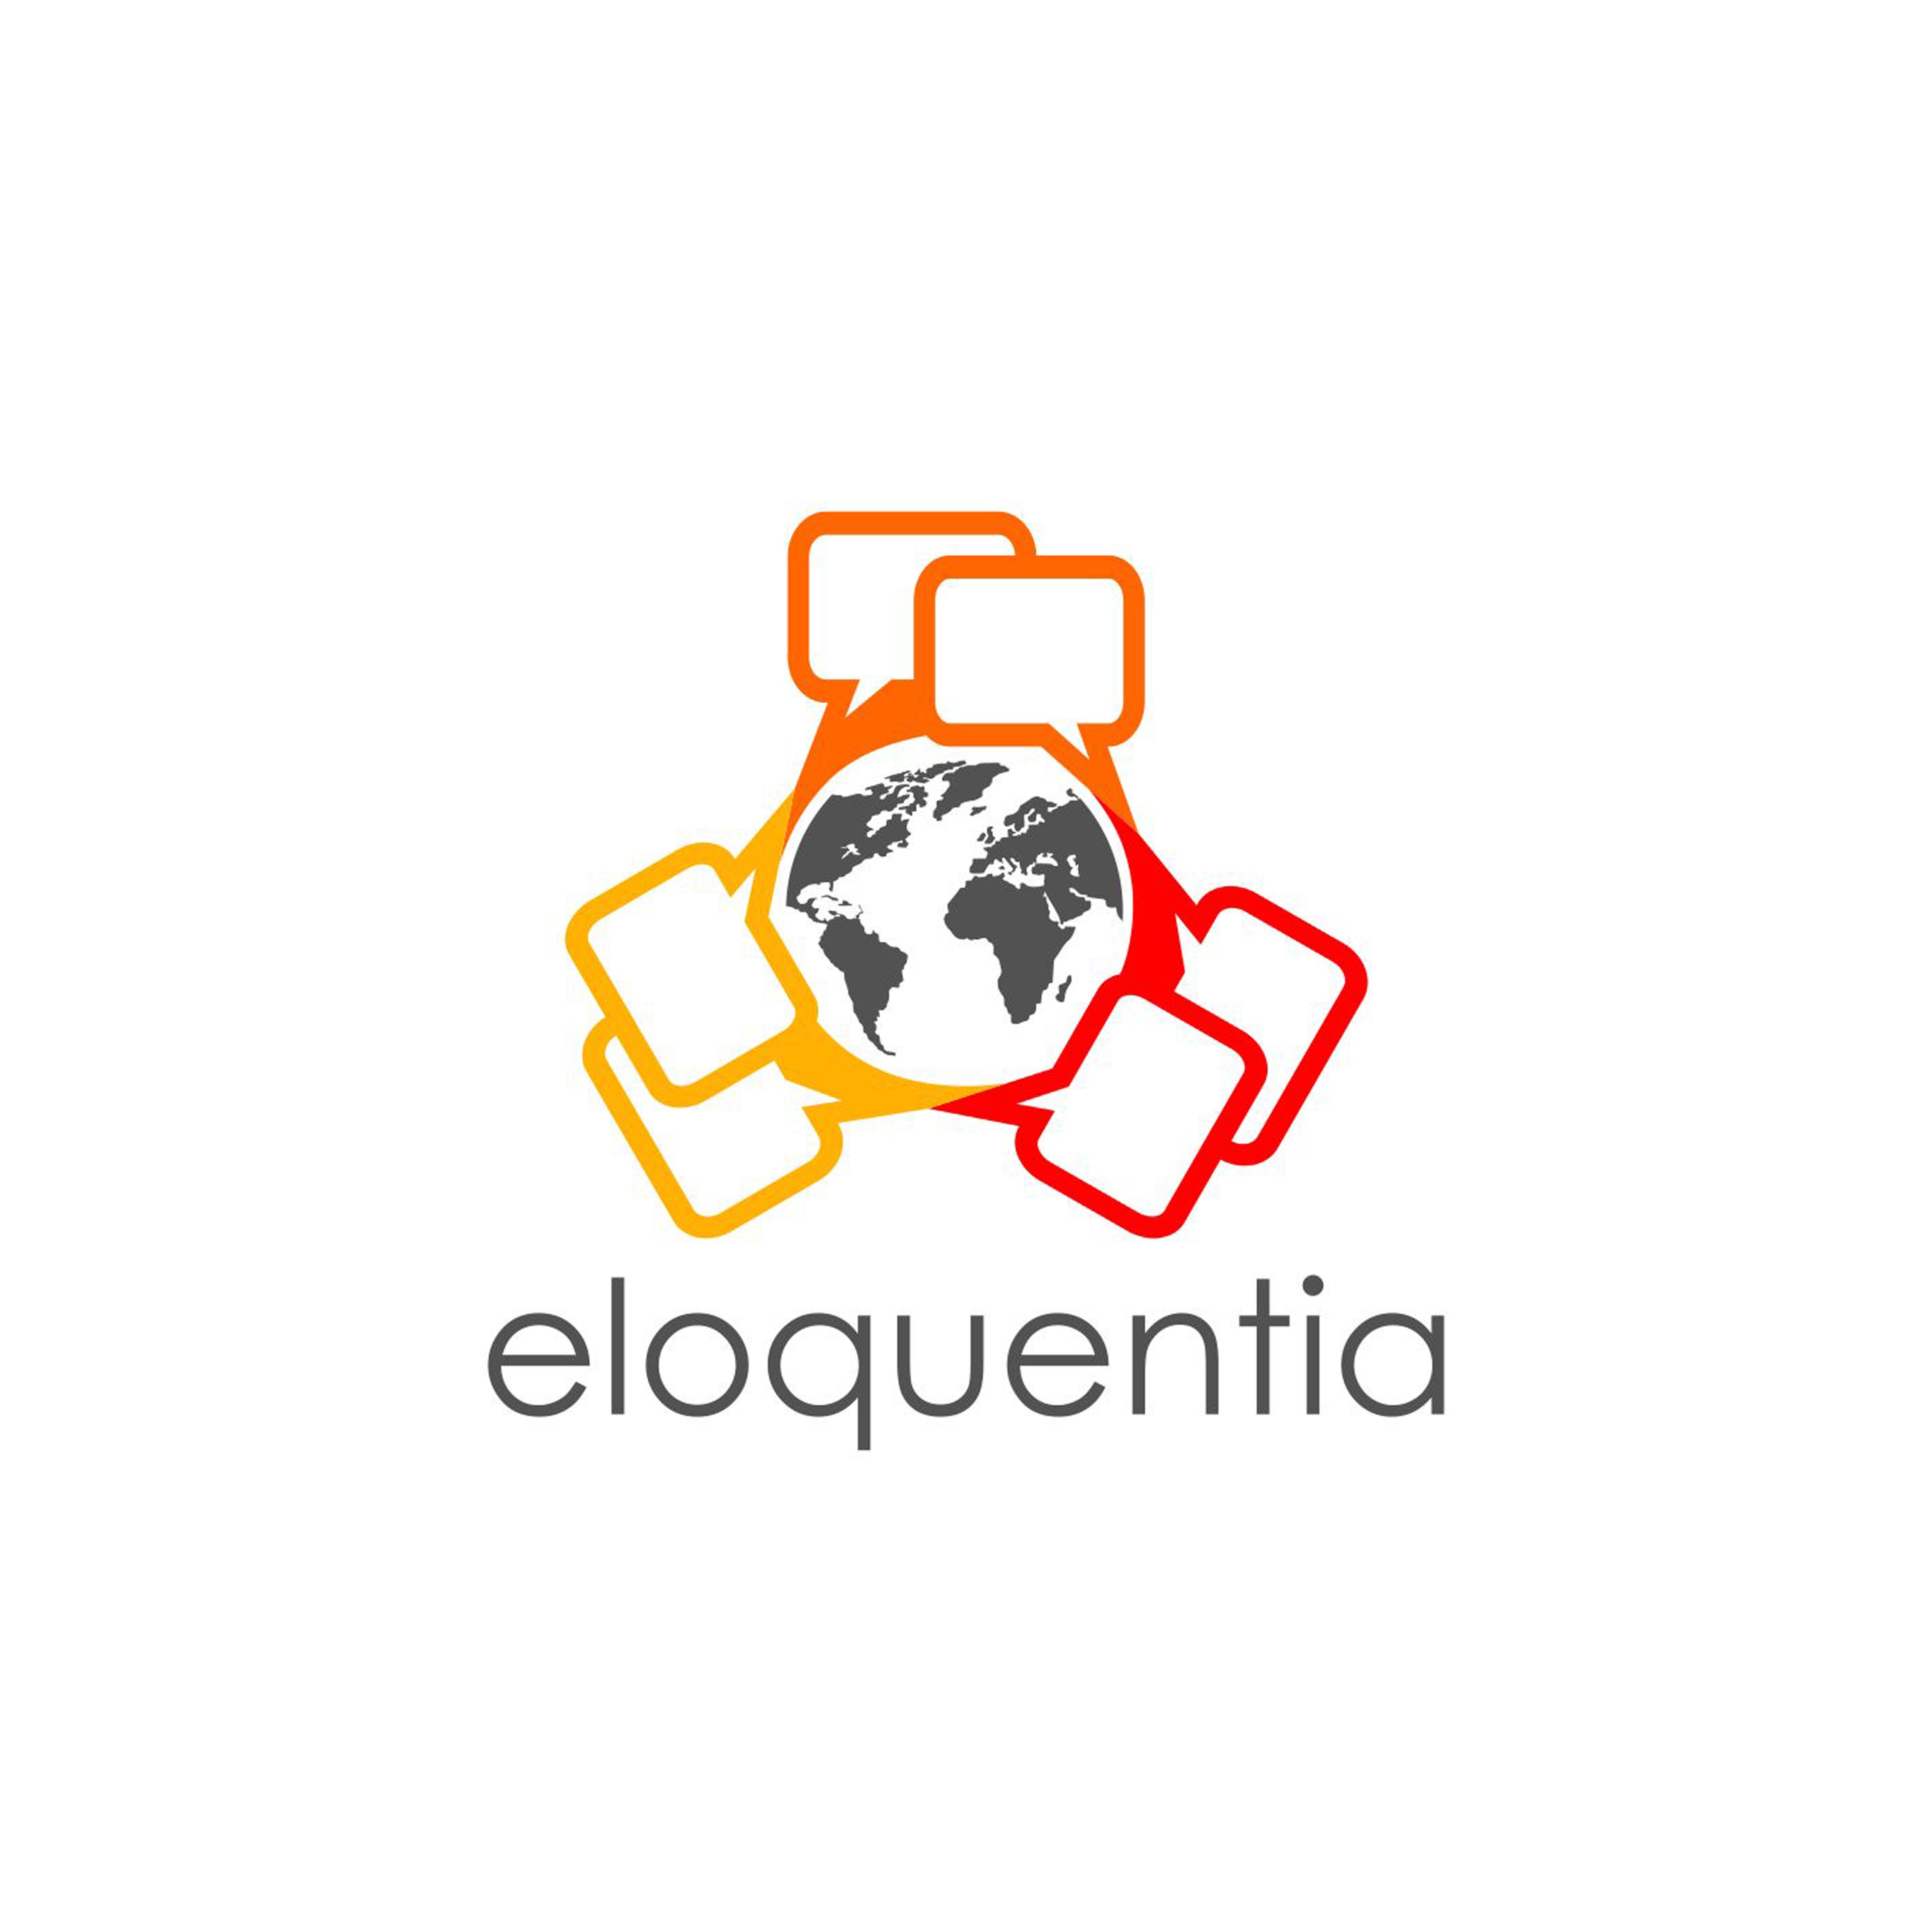 Design an elegant global logo for eloquentia